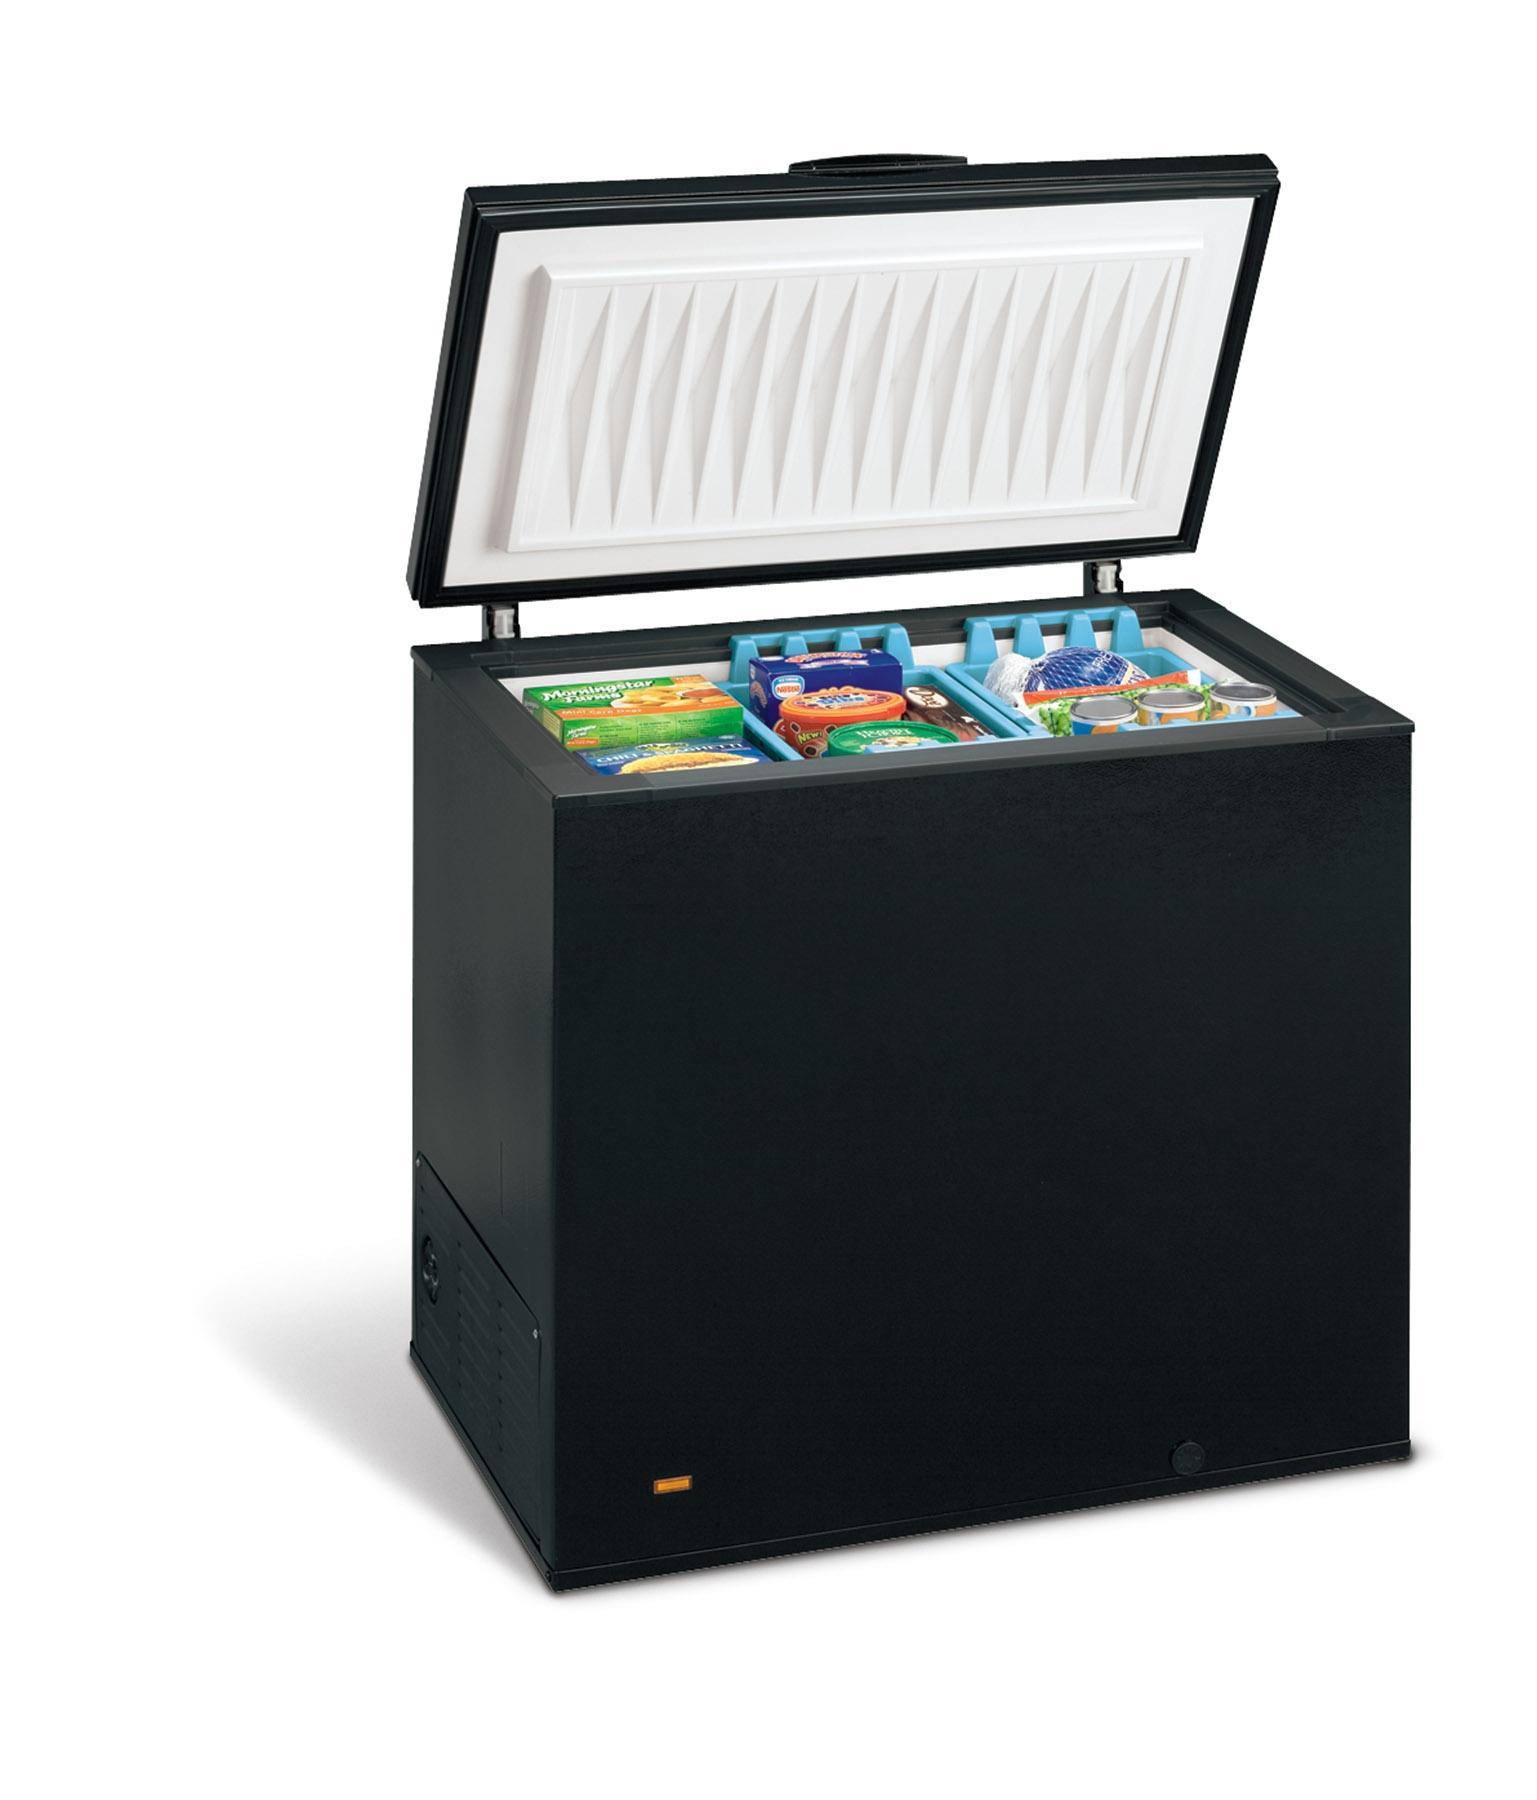 Frigidaire Ffc0723gb 7 2 Cu Ft Chest Freezer With Manual